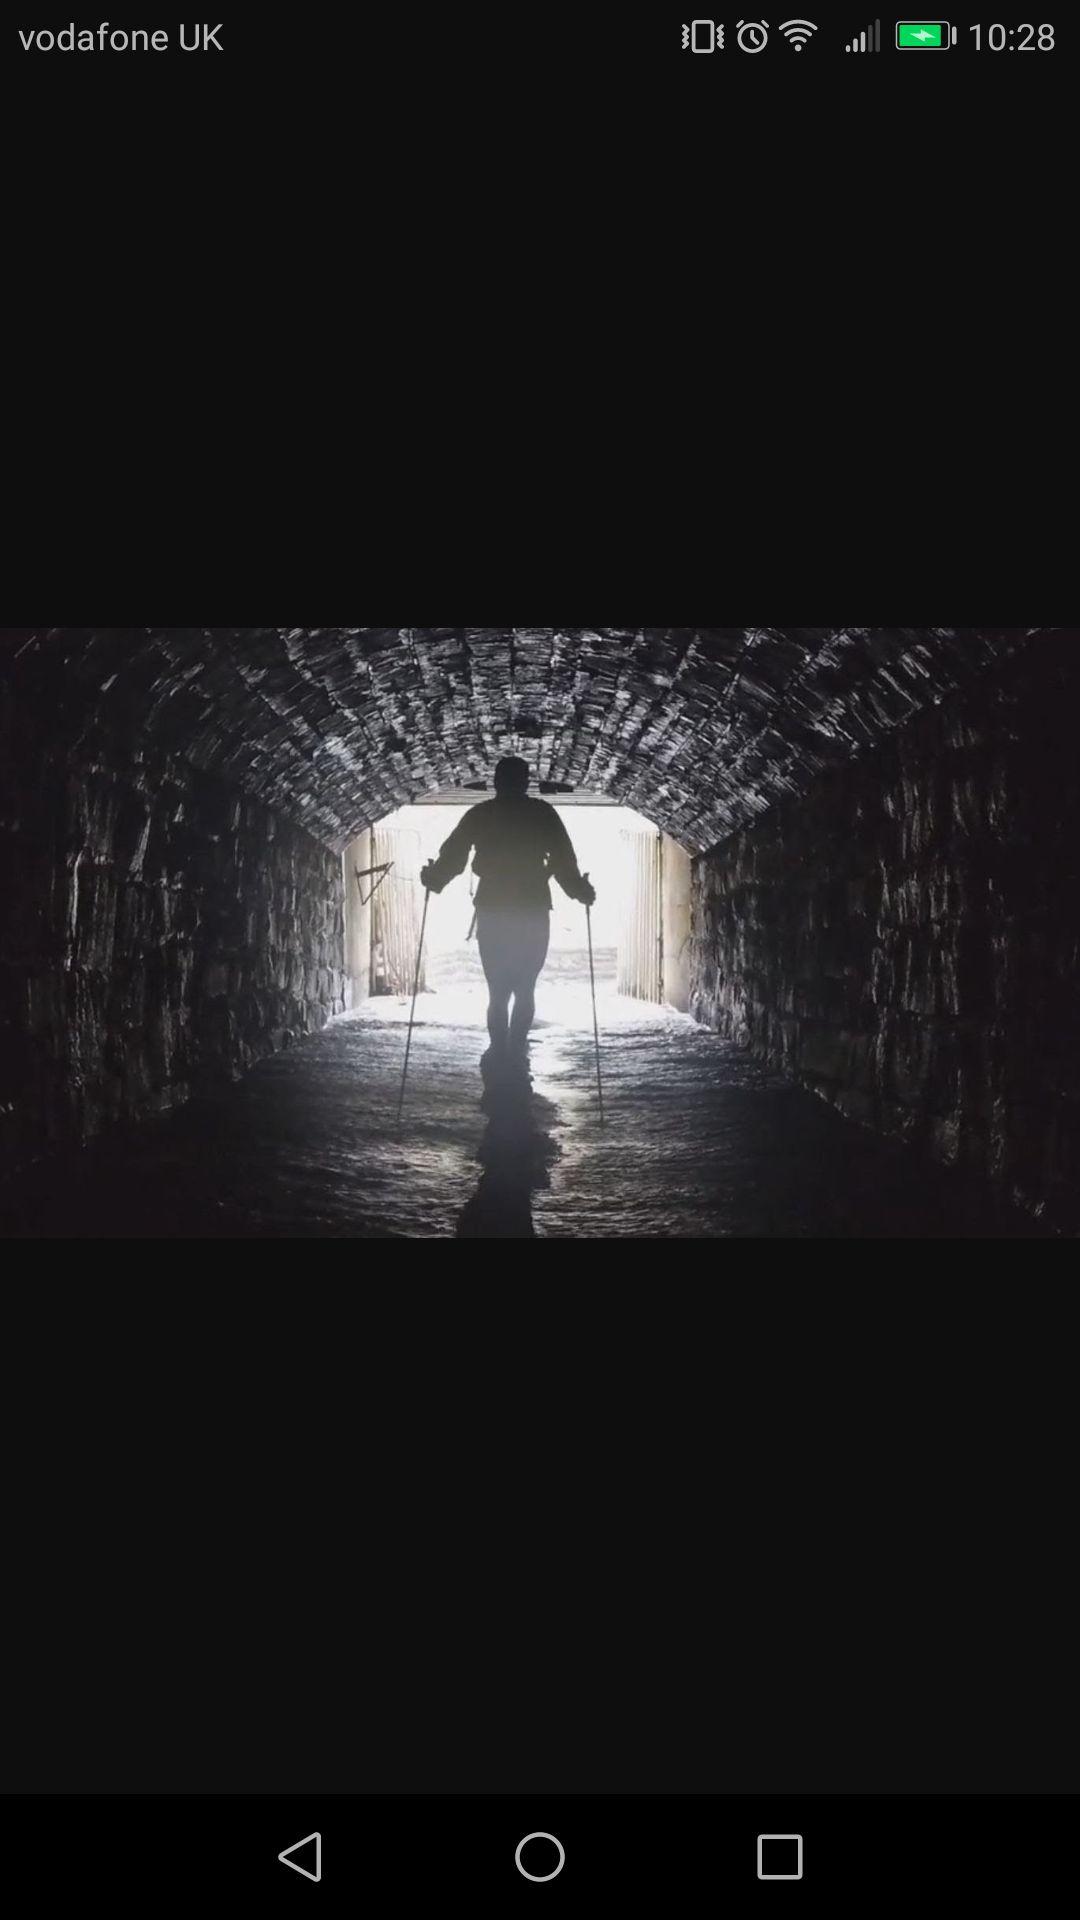 BIF50 tunnel photo